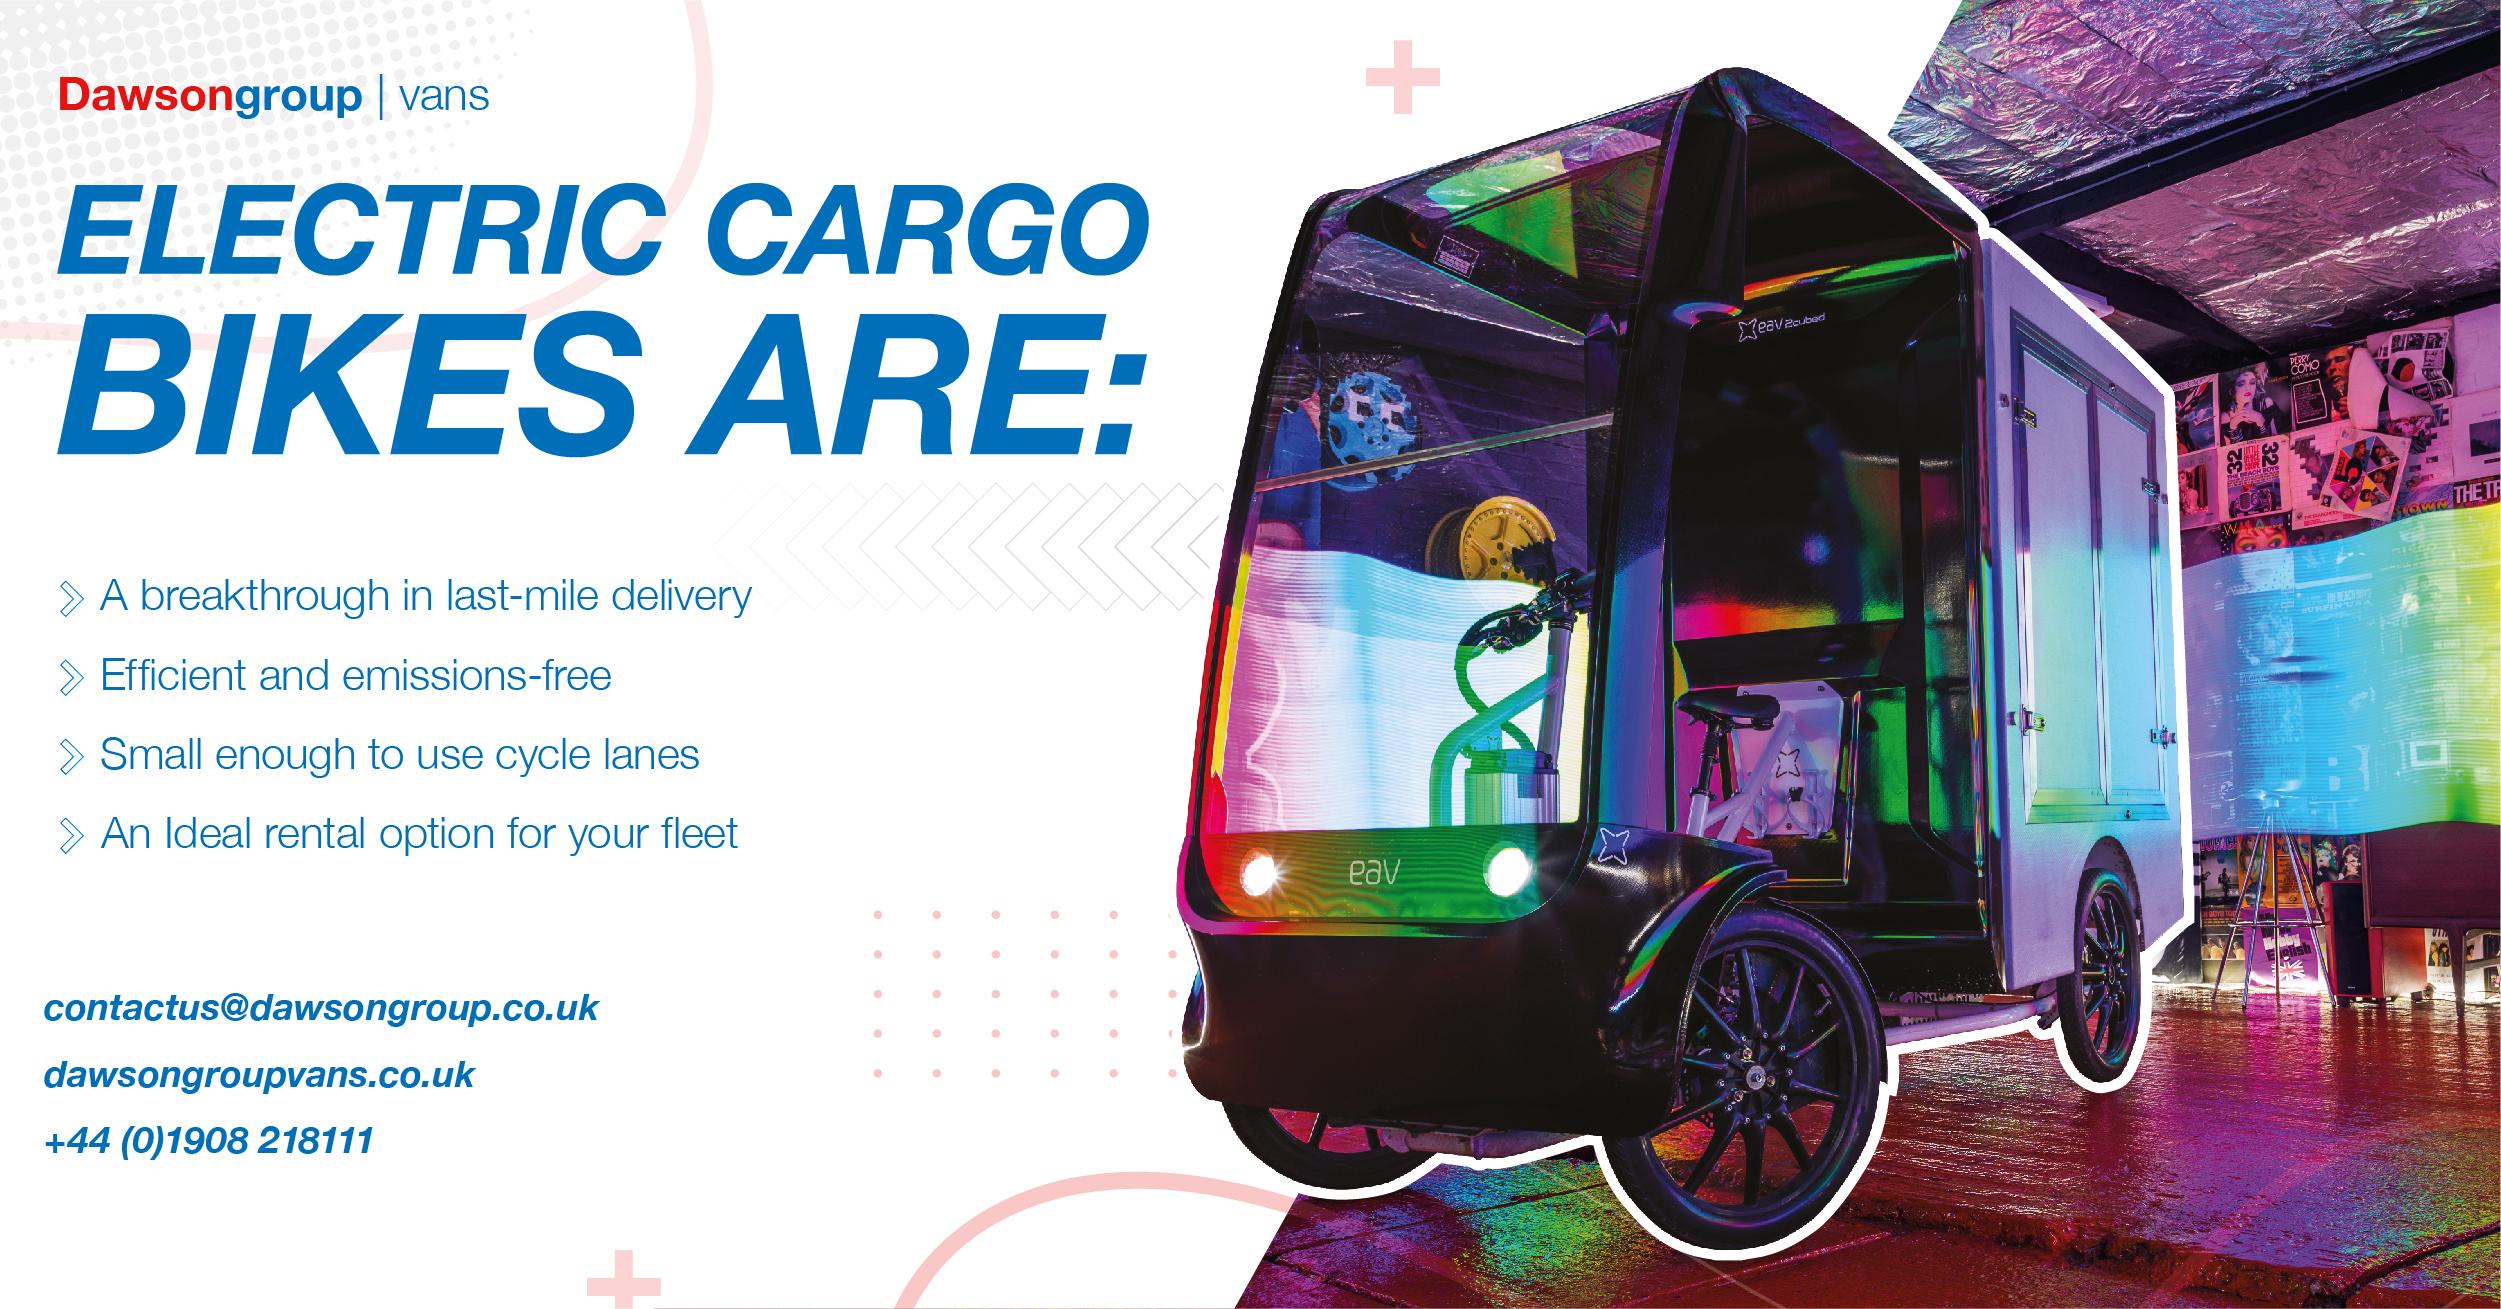 Electric cargo bikes are